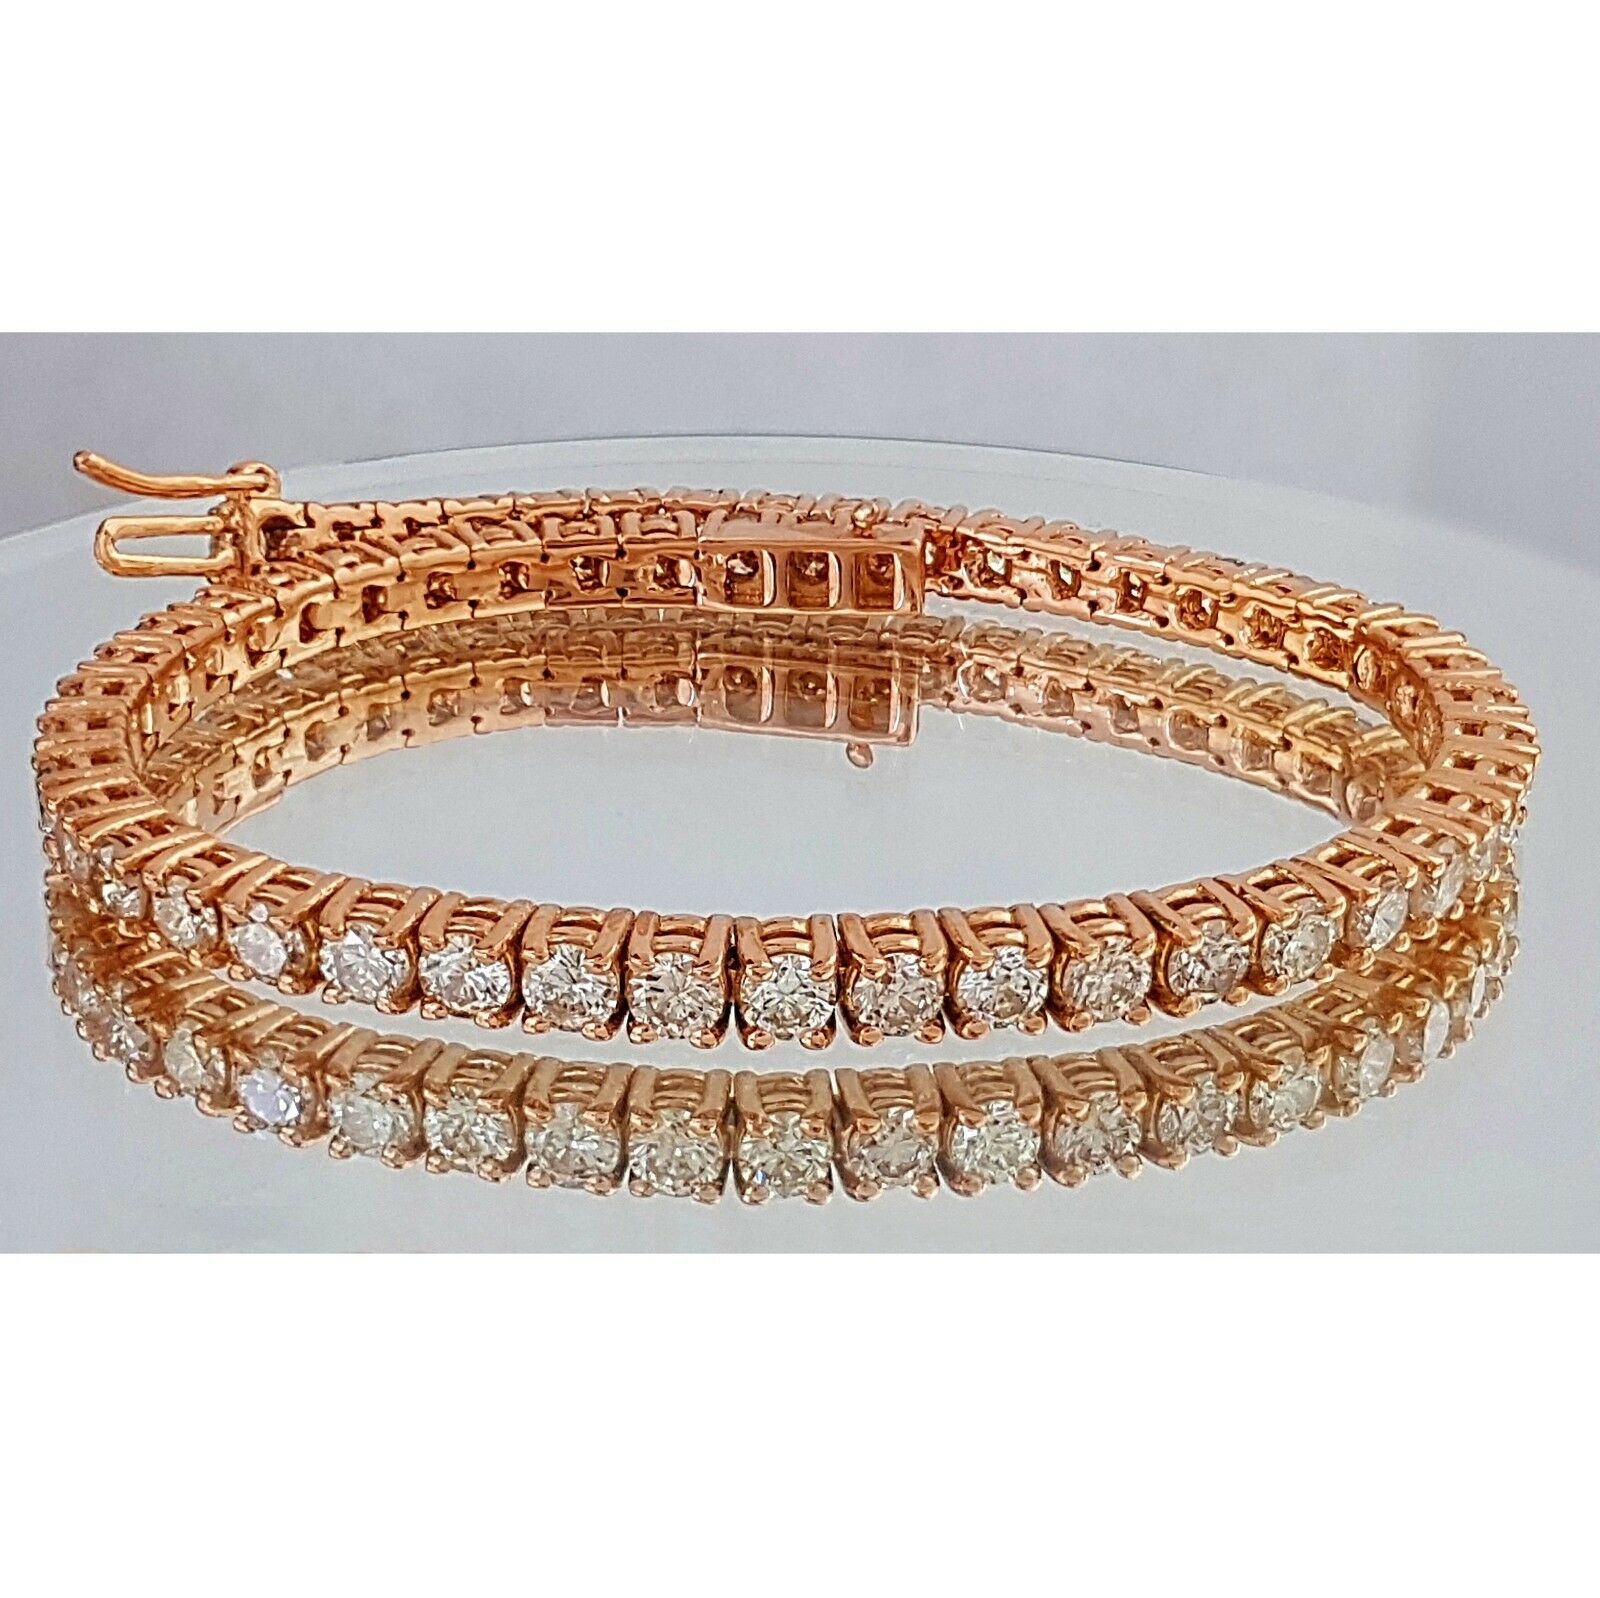 7e65f0667145d diamond 14k gold pink cut round 6.50CT tennis ct VS1 F-G CERTIFIED ...